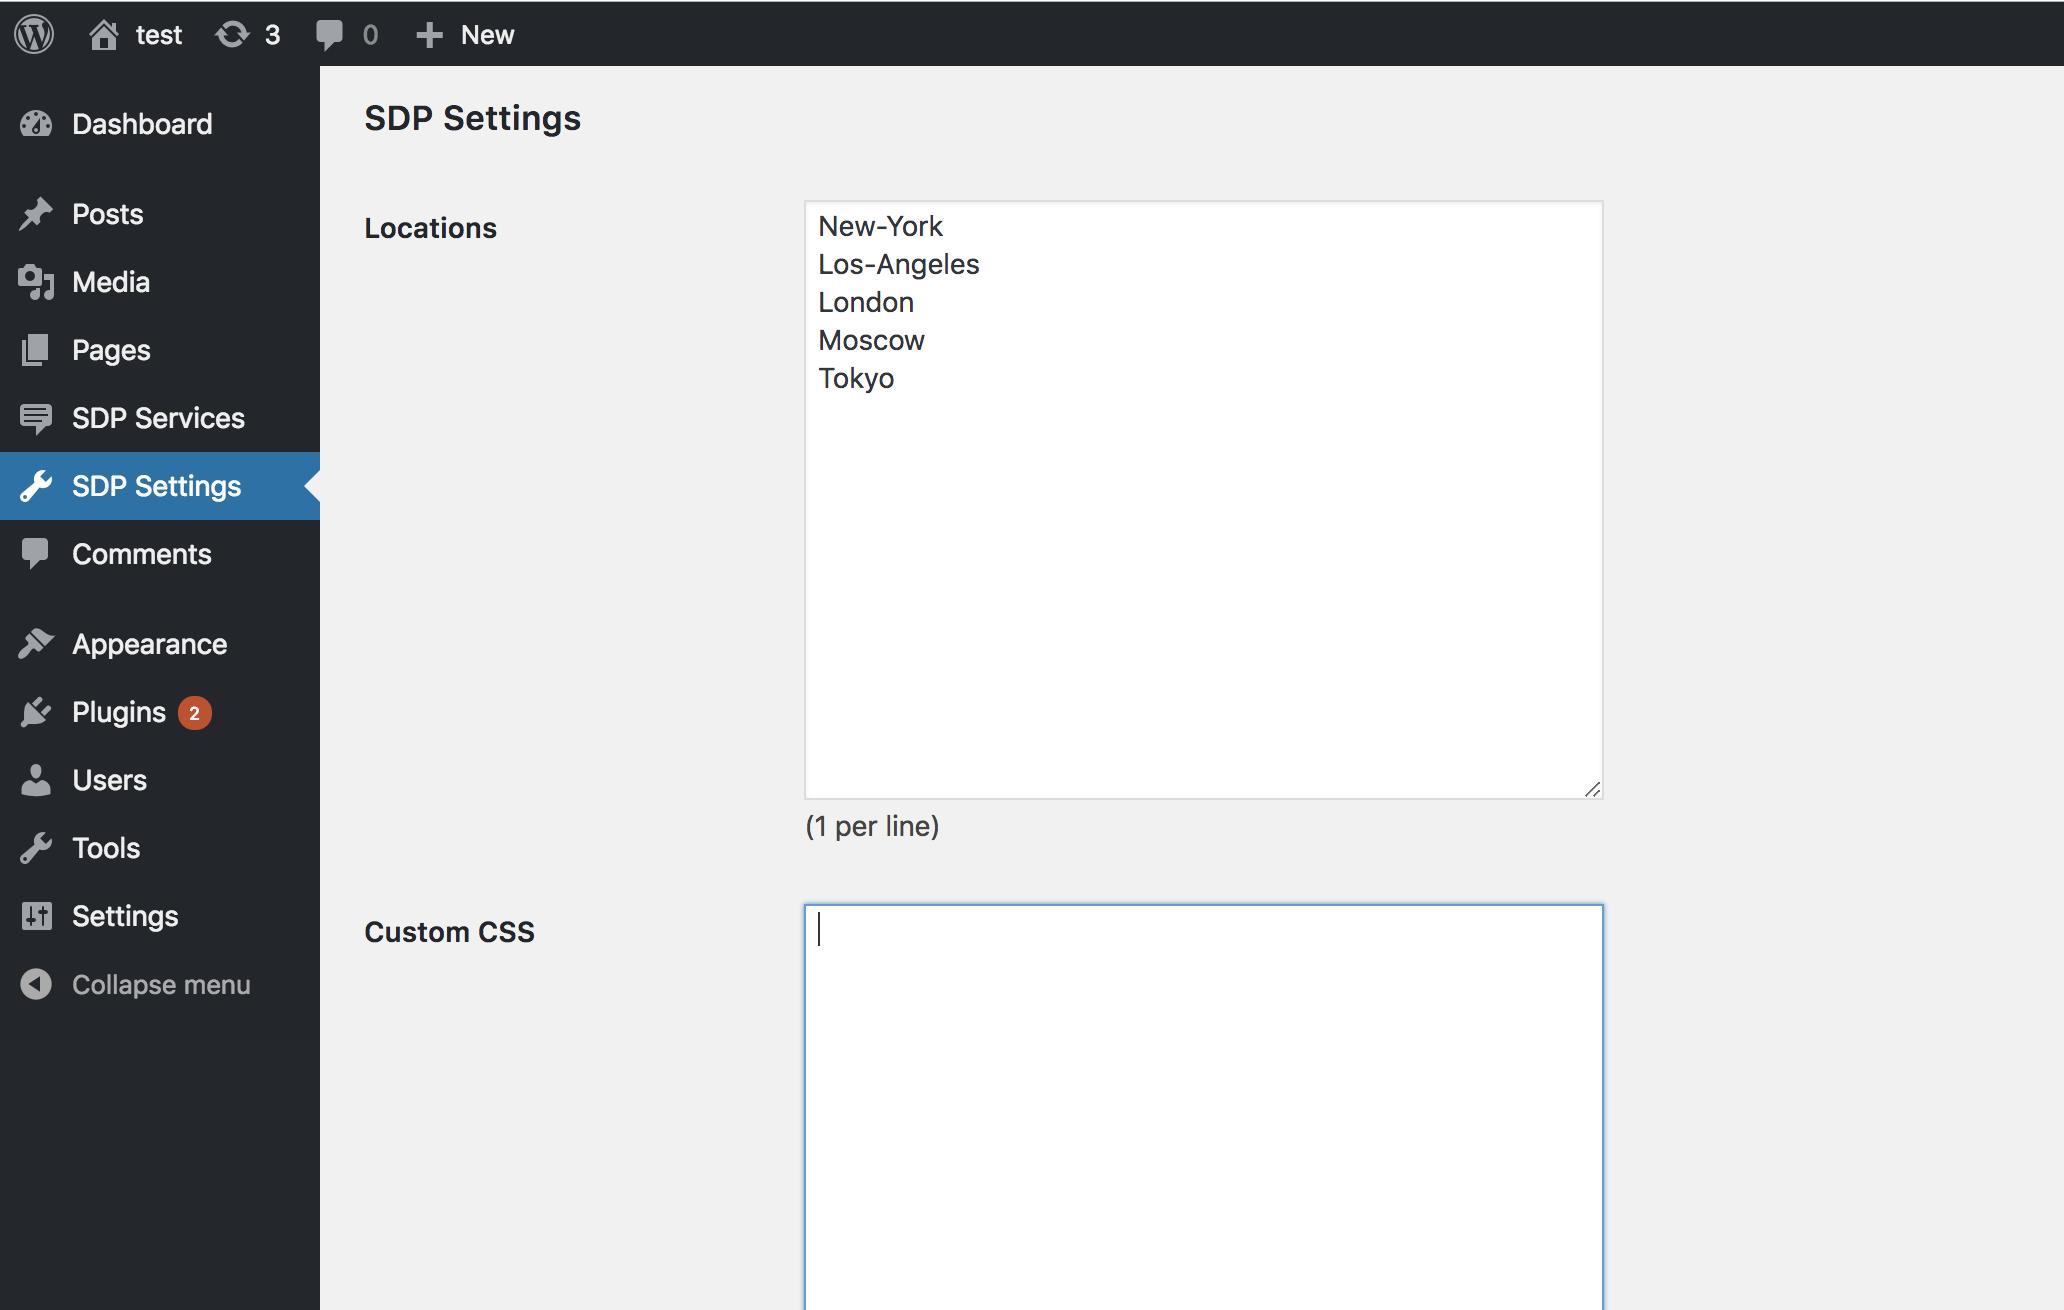 Setup locations and custom CSS